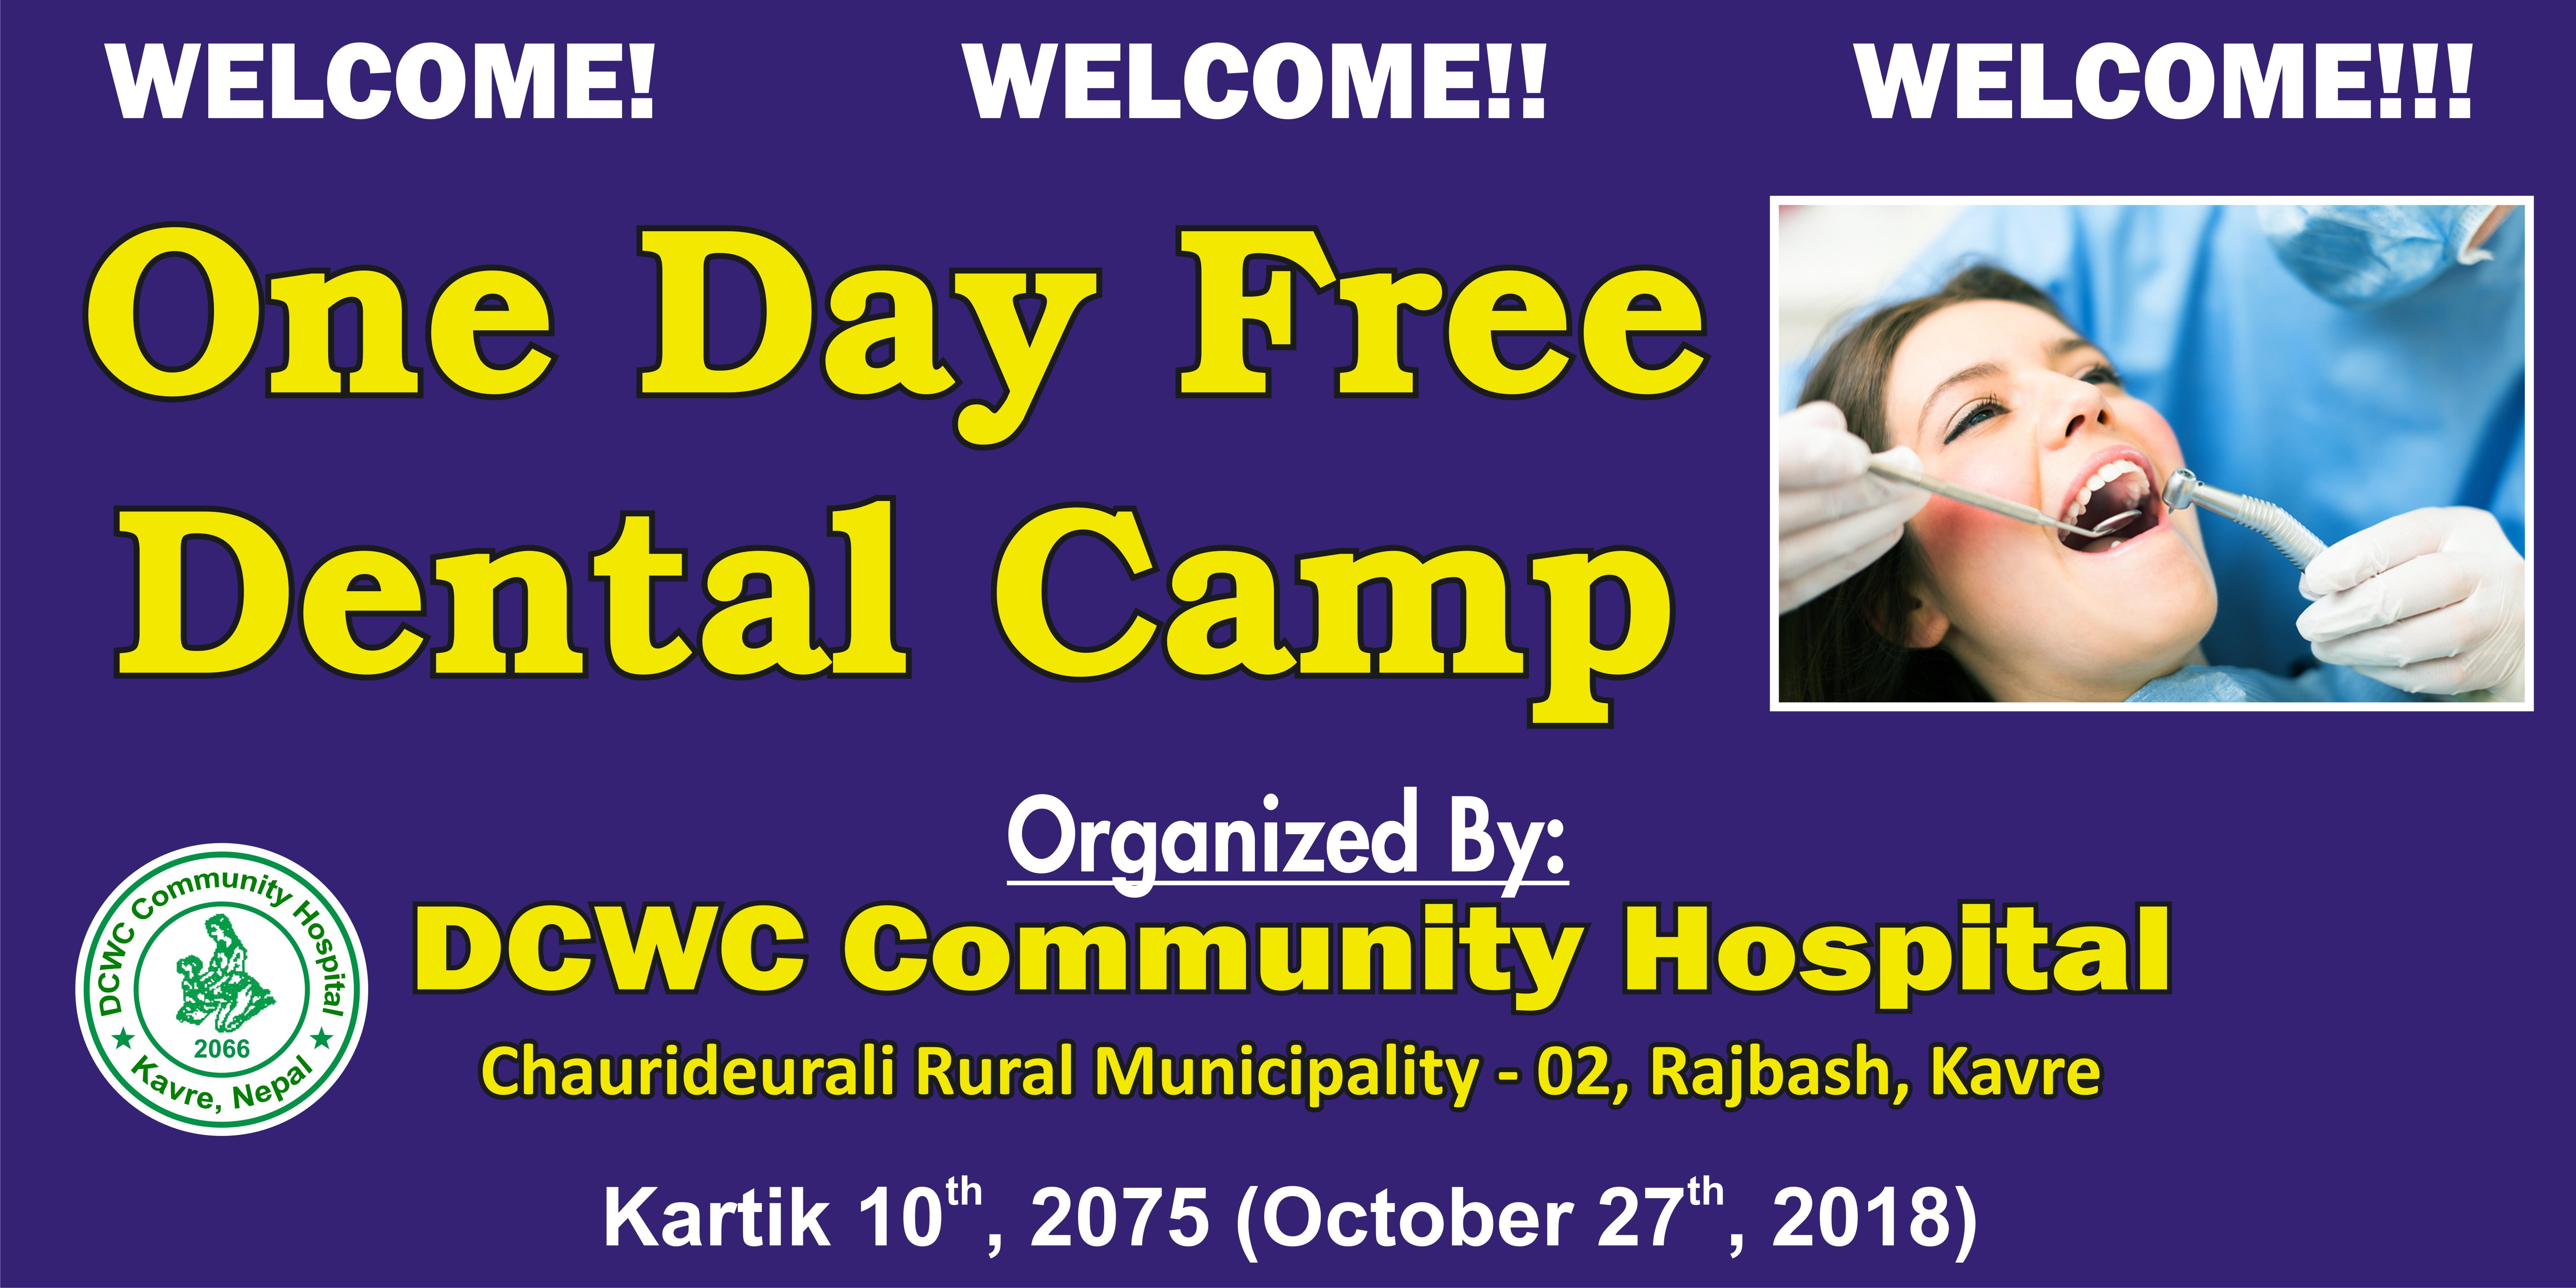 One Day Free Dental Camp - 27th October 2018 (Kartik 10th 2075)